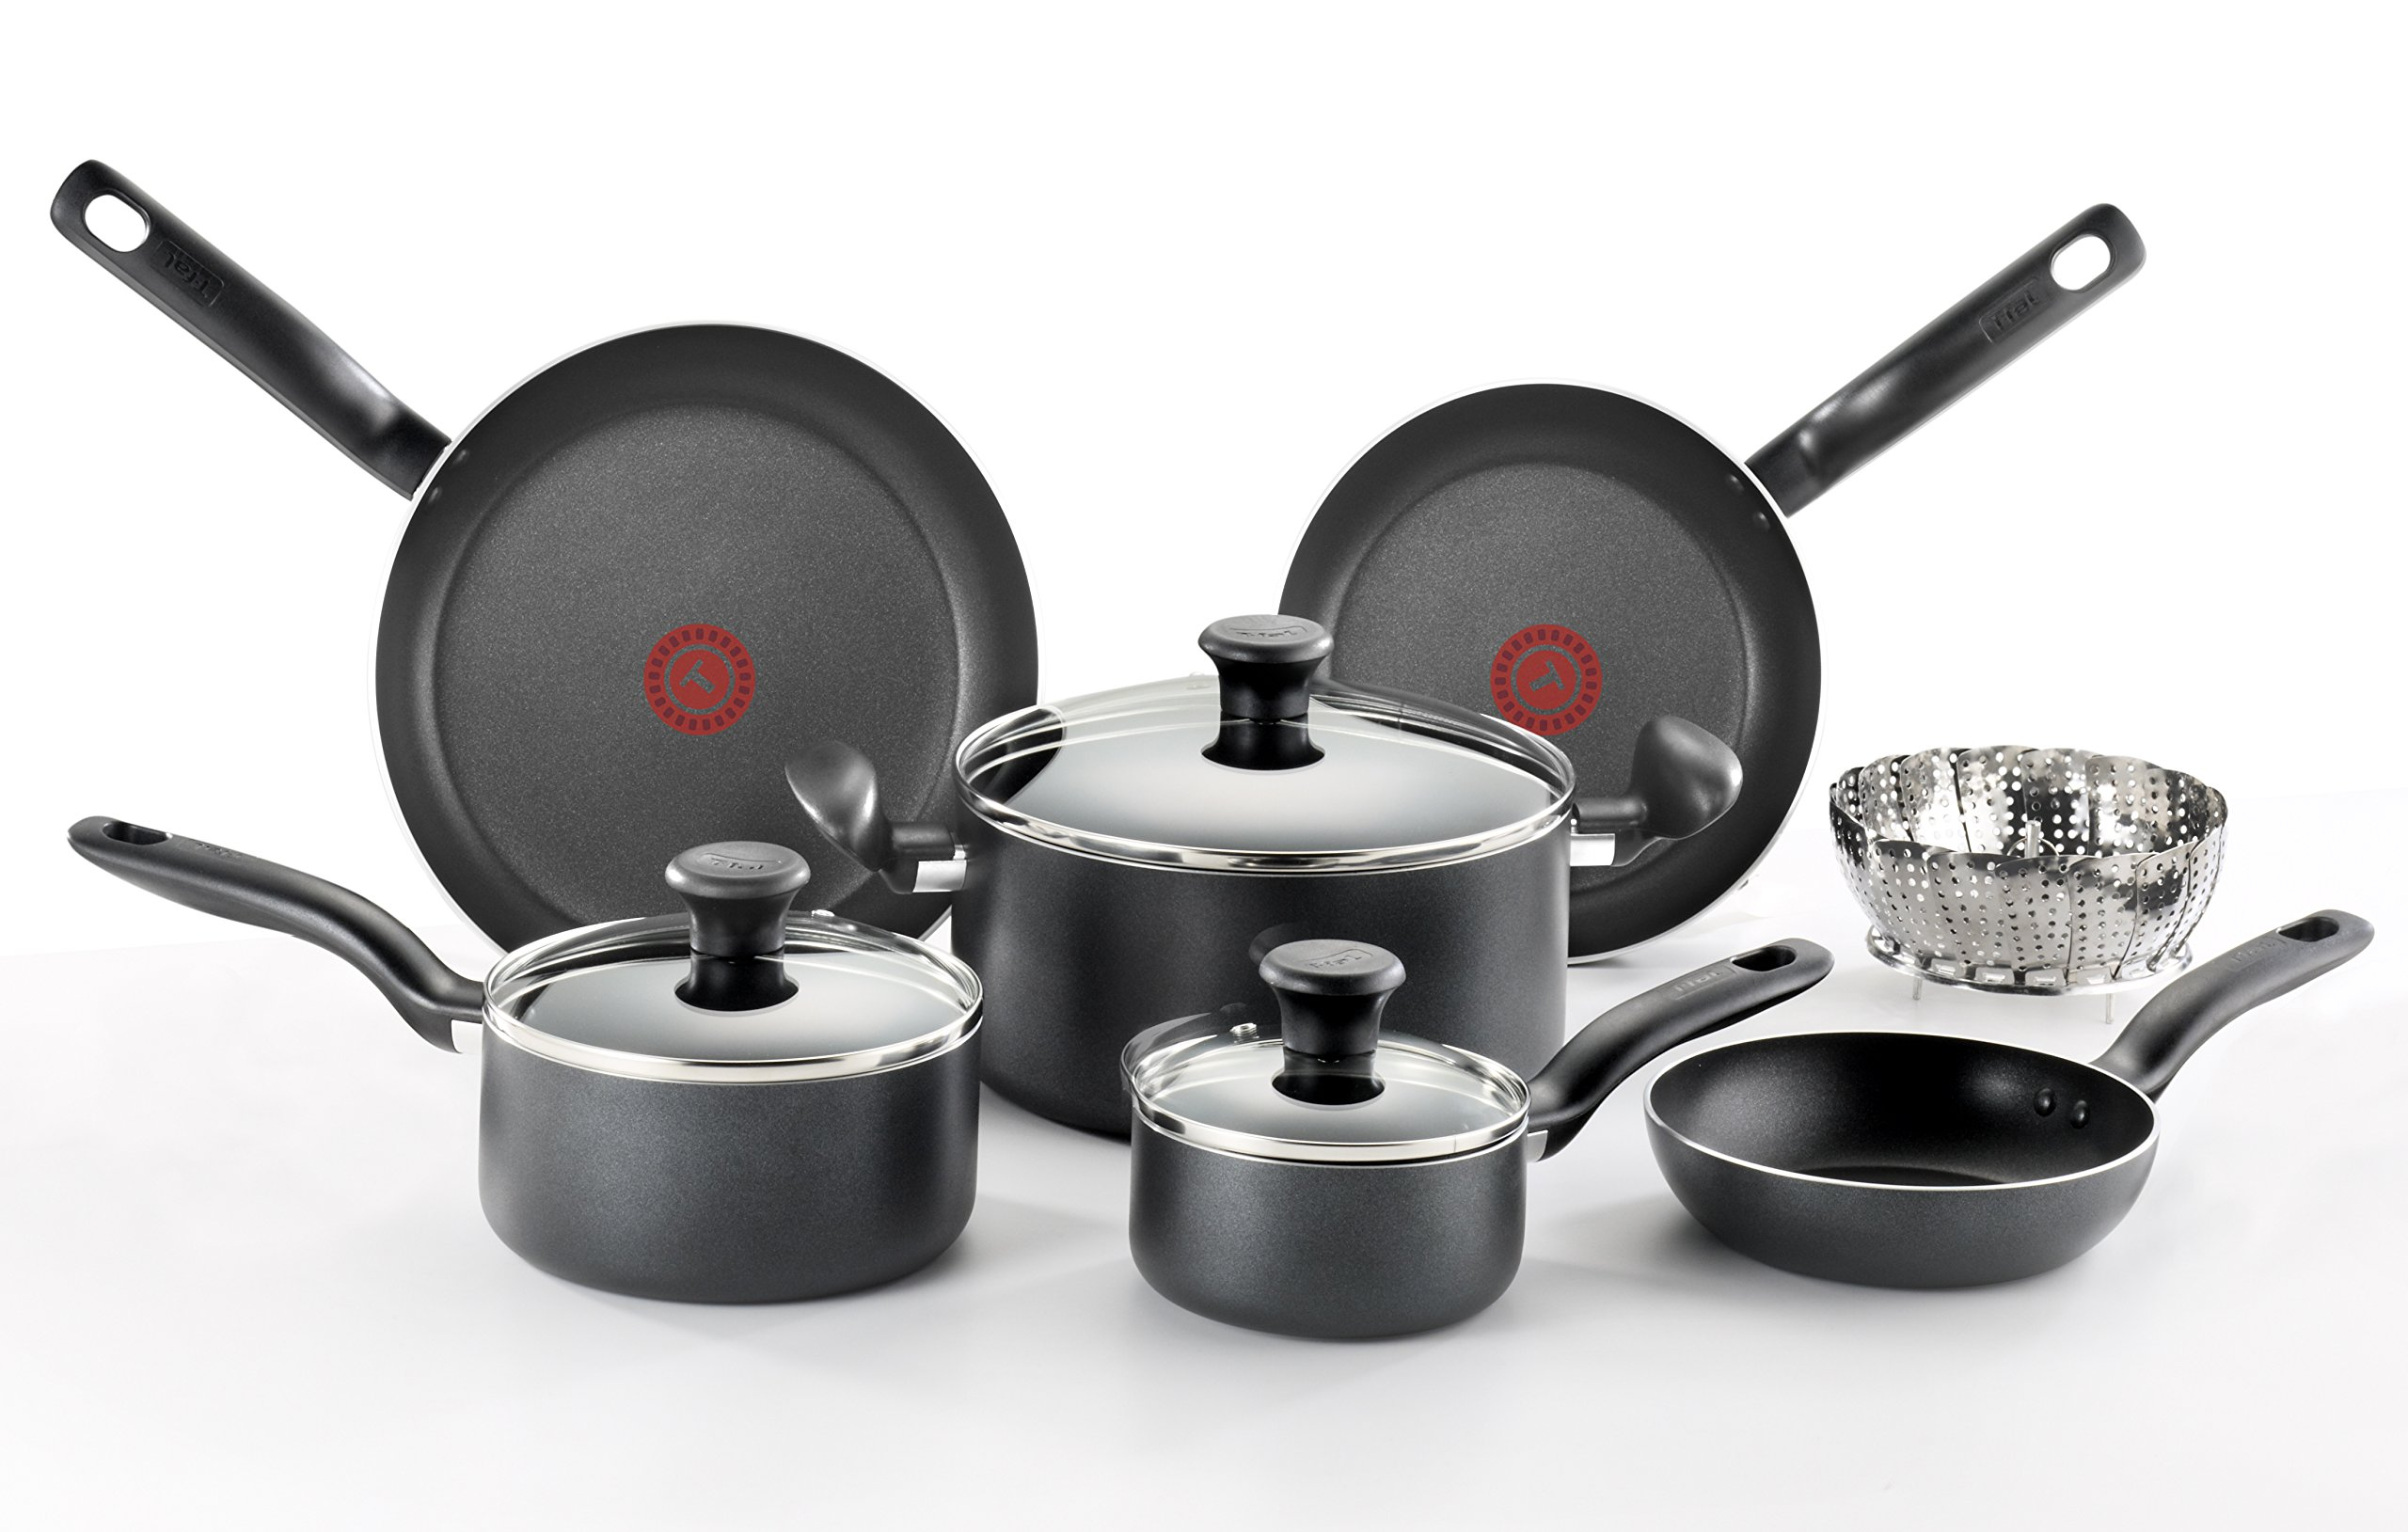 T-fal C996SE Initiatives Nonstick Ceramic Coating PTFE PFOA and Cadmium Free Scratch Resistant Dishwasher Safe Oven Safe Cookware Set, 14-Piece, Black 81mYppziefL